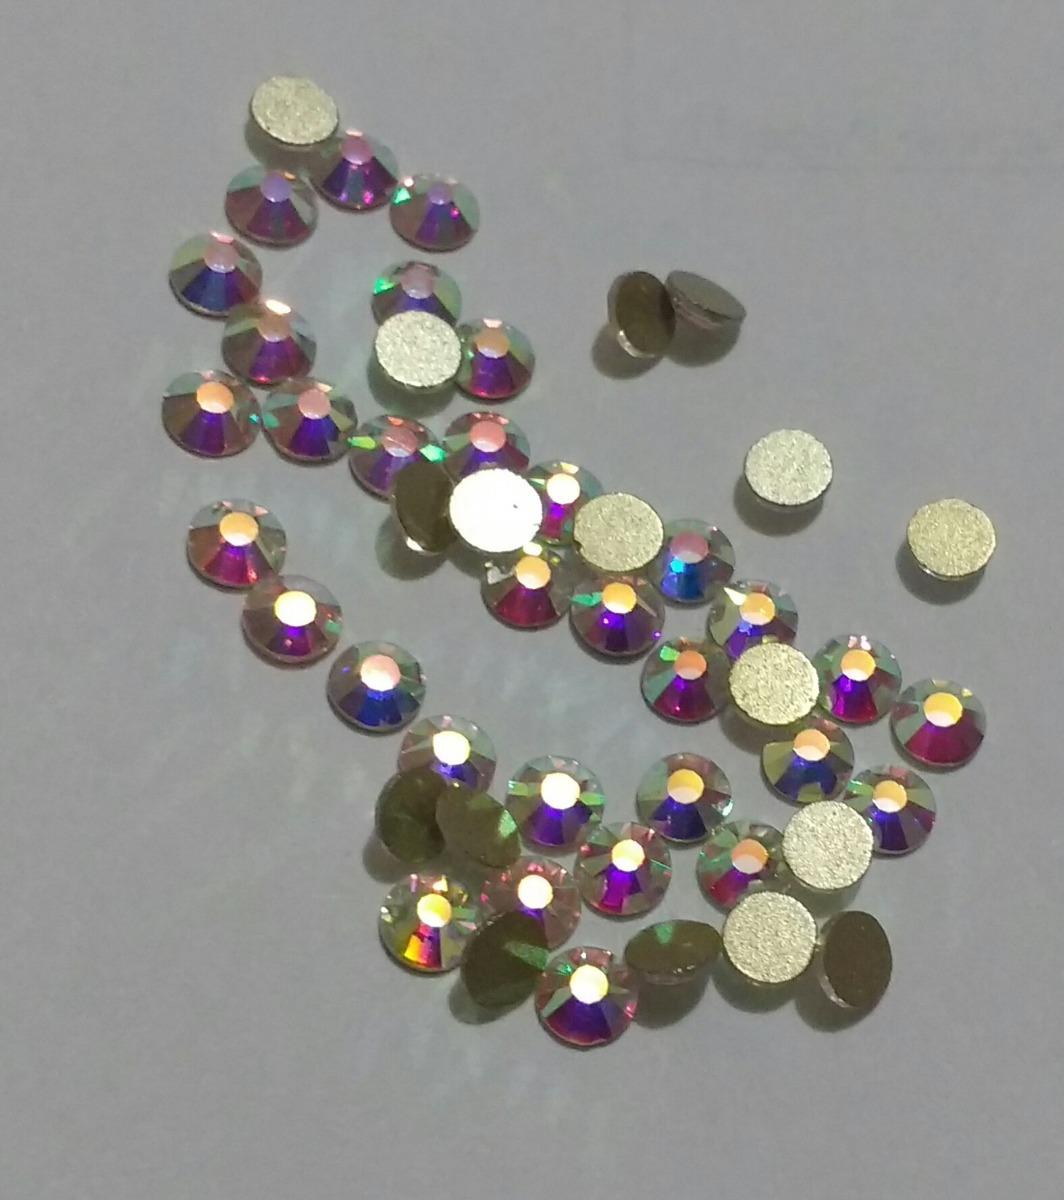 Pedreria cristal 20 swarovski decoracion u as piedra for Decoracion de unas con piedras swarovski